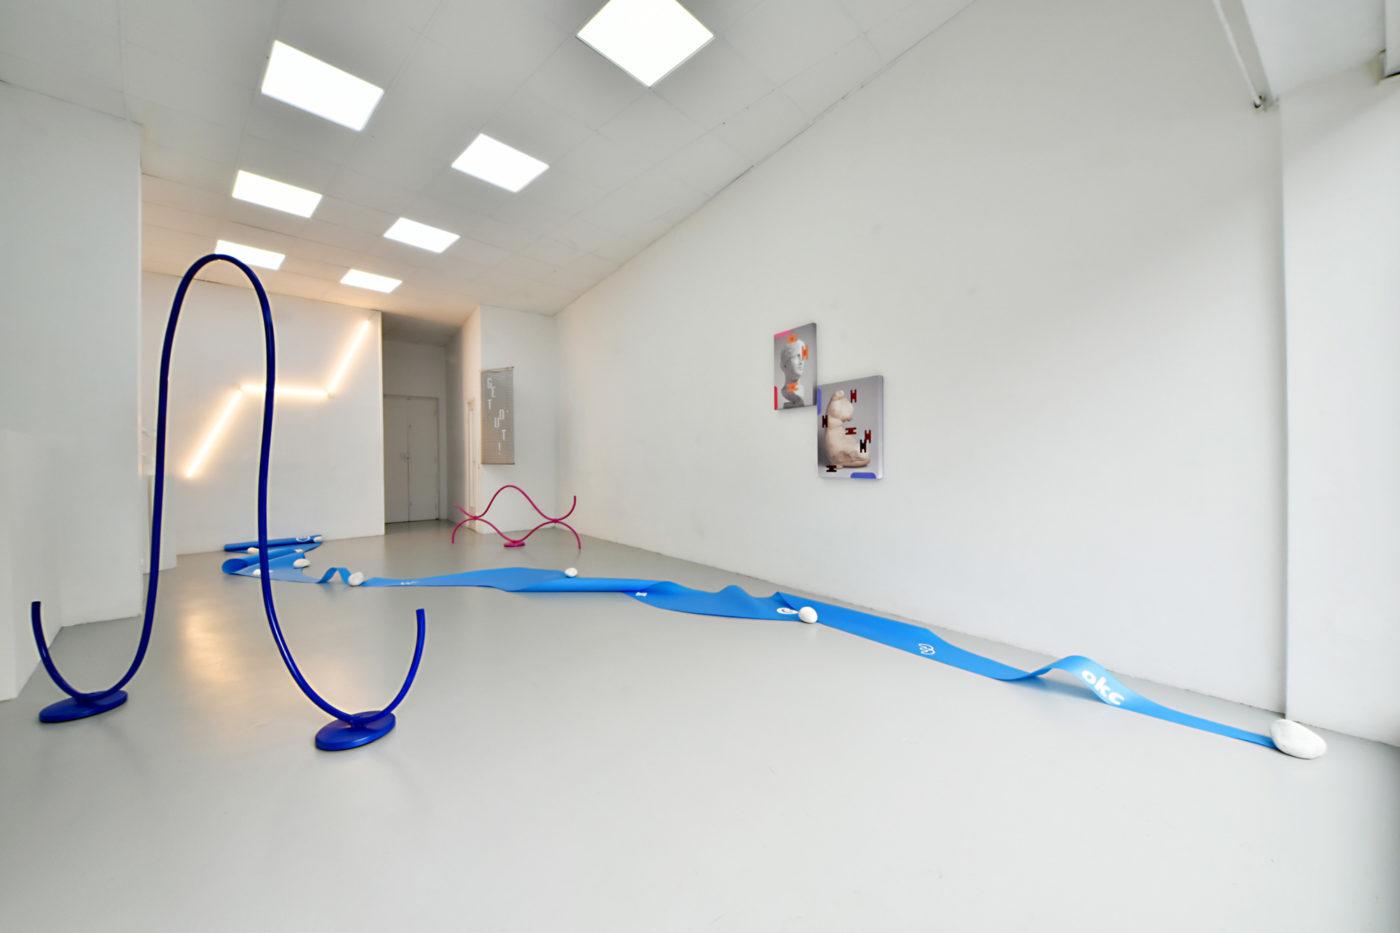 Nicola Gobbetto - Filler, Dimora Artica, Milano